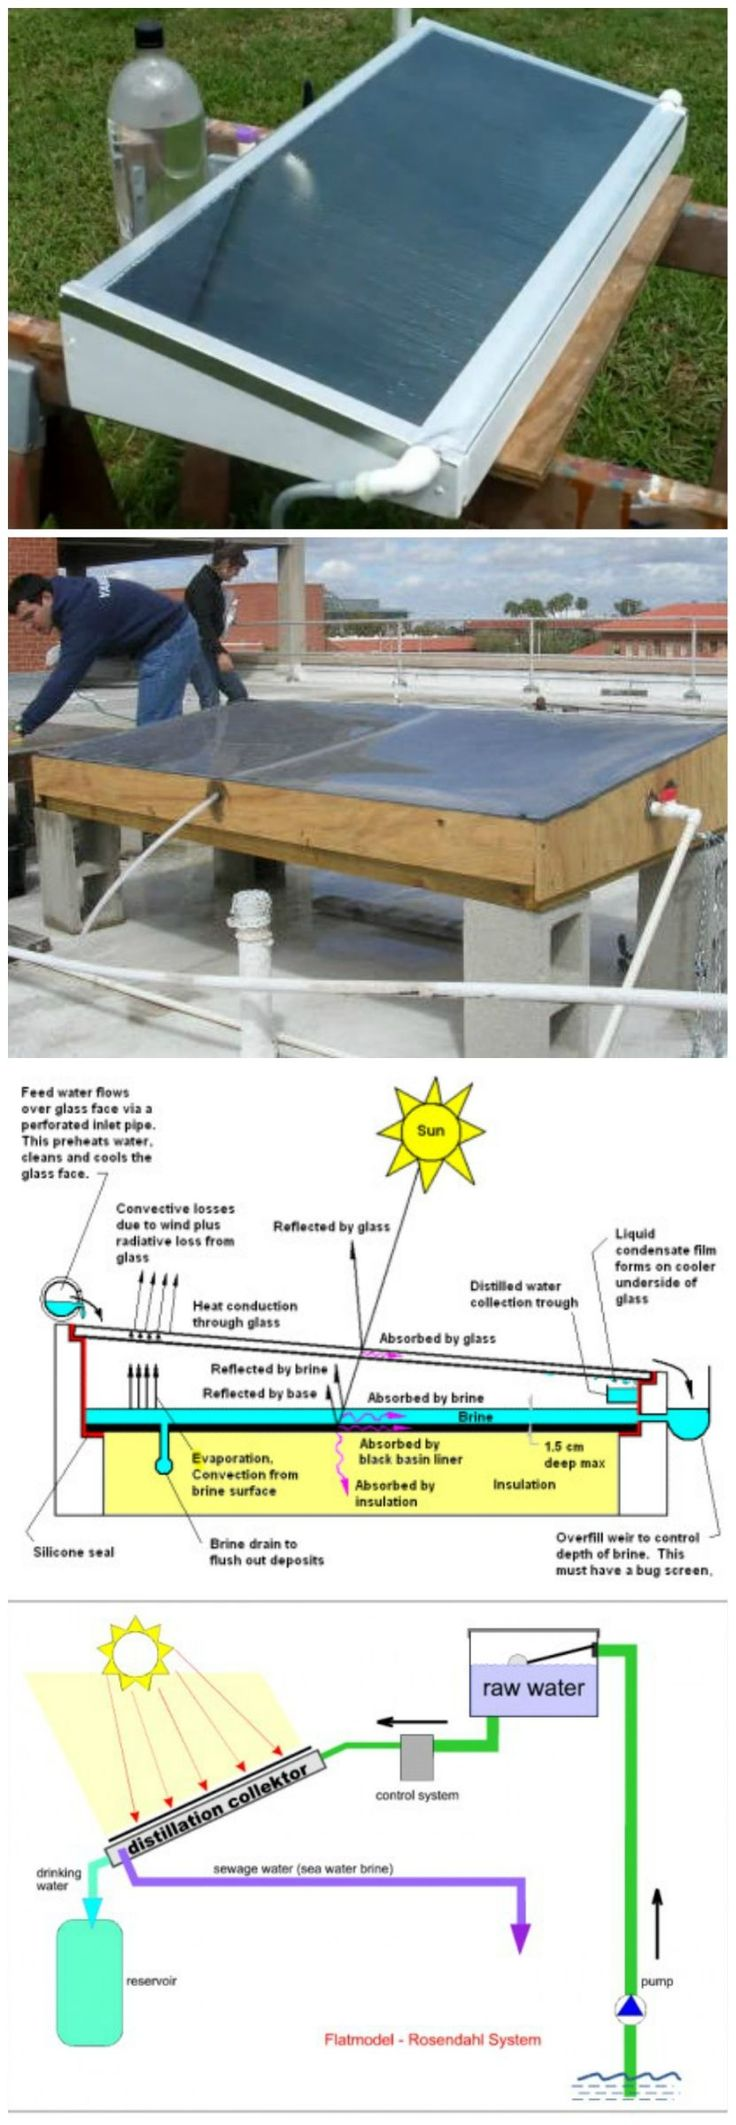 28 Best Energ Images On Pinterest Renewable Energy Technology Automatic Ac Transfer Switch Ecorenovator Diy Solar Water Distiller